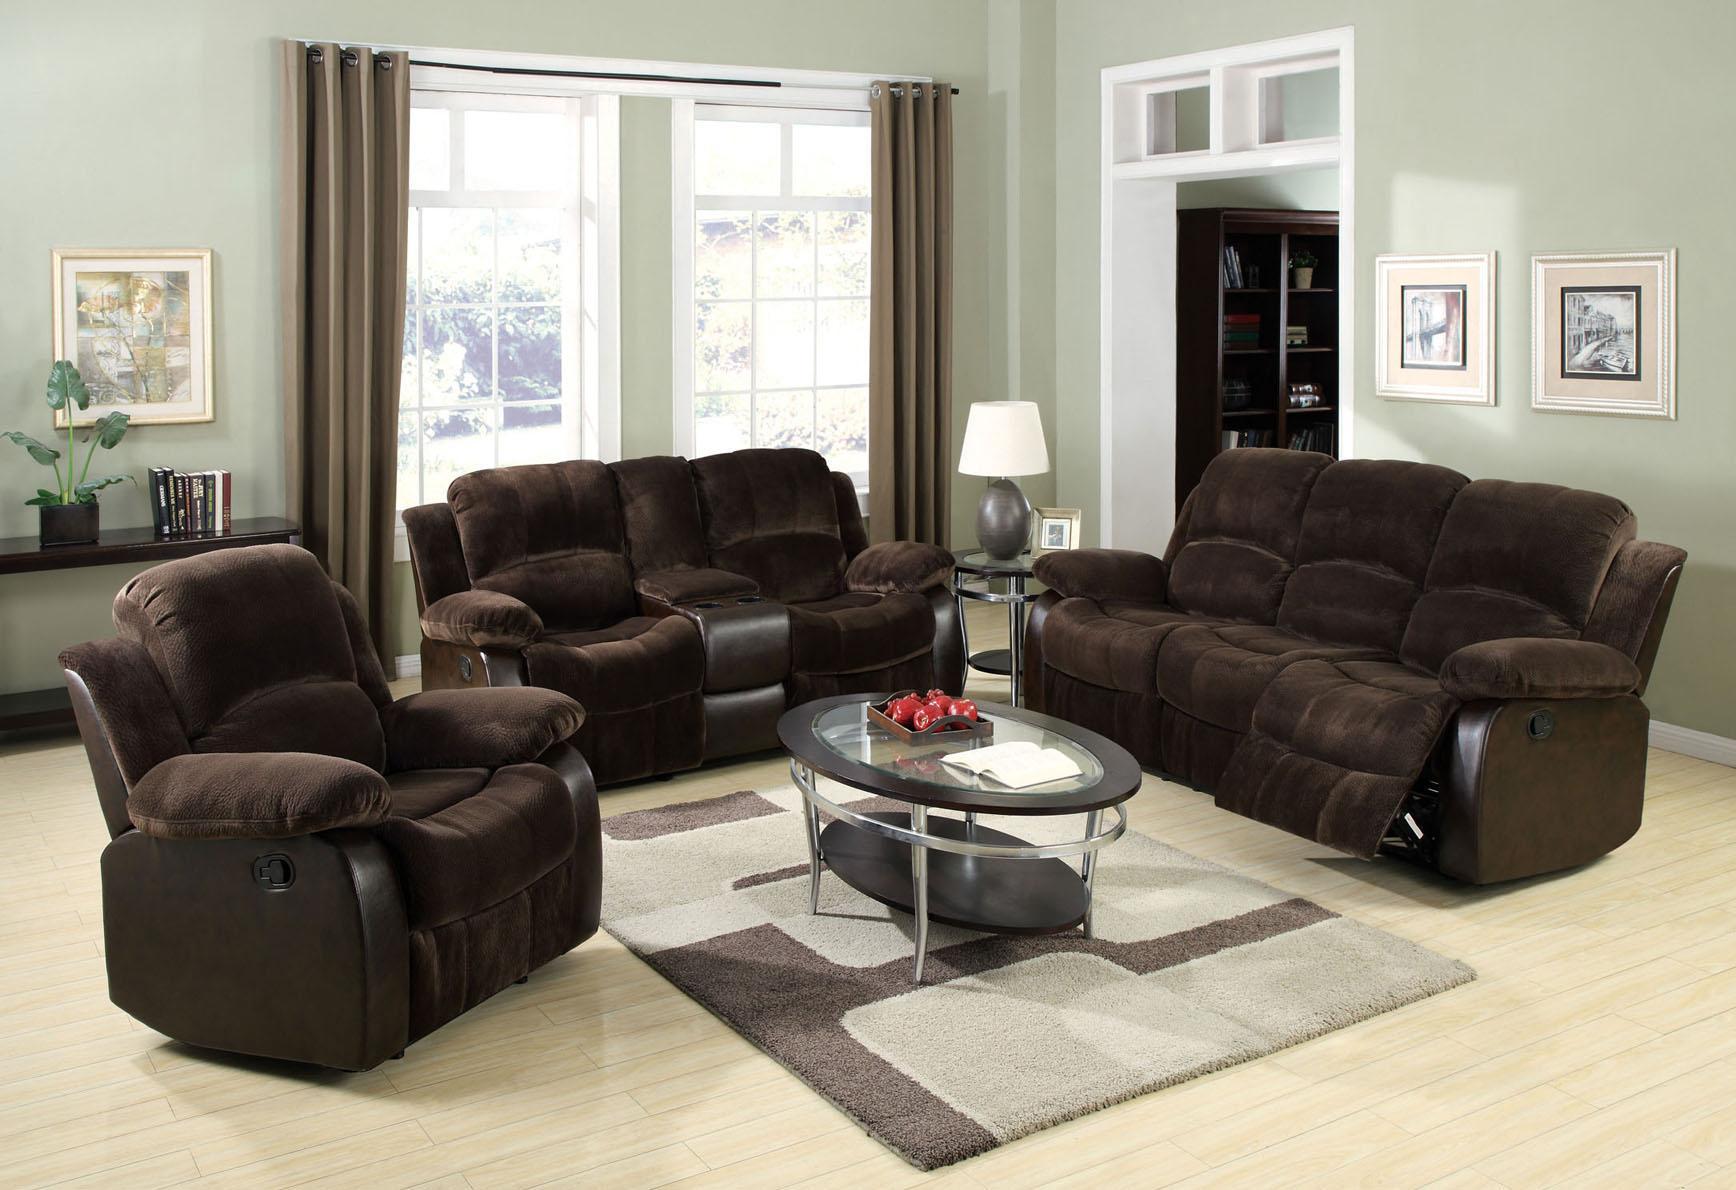 Acme Furniture Masaccio Reclining Living Room Group - Item Number: 50473 Reclining Living Room Group